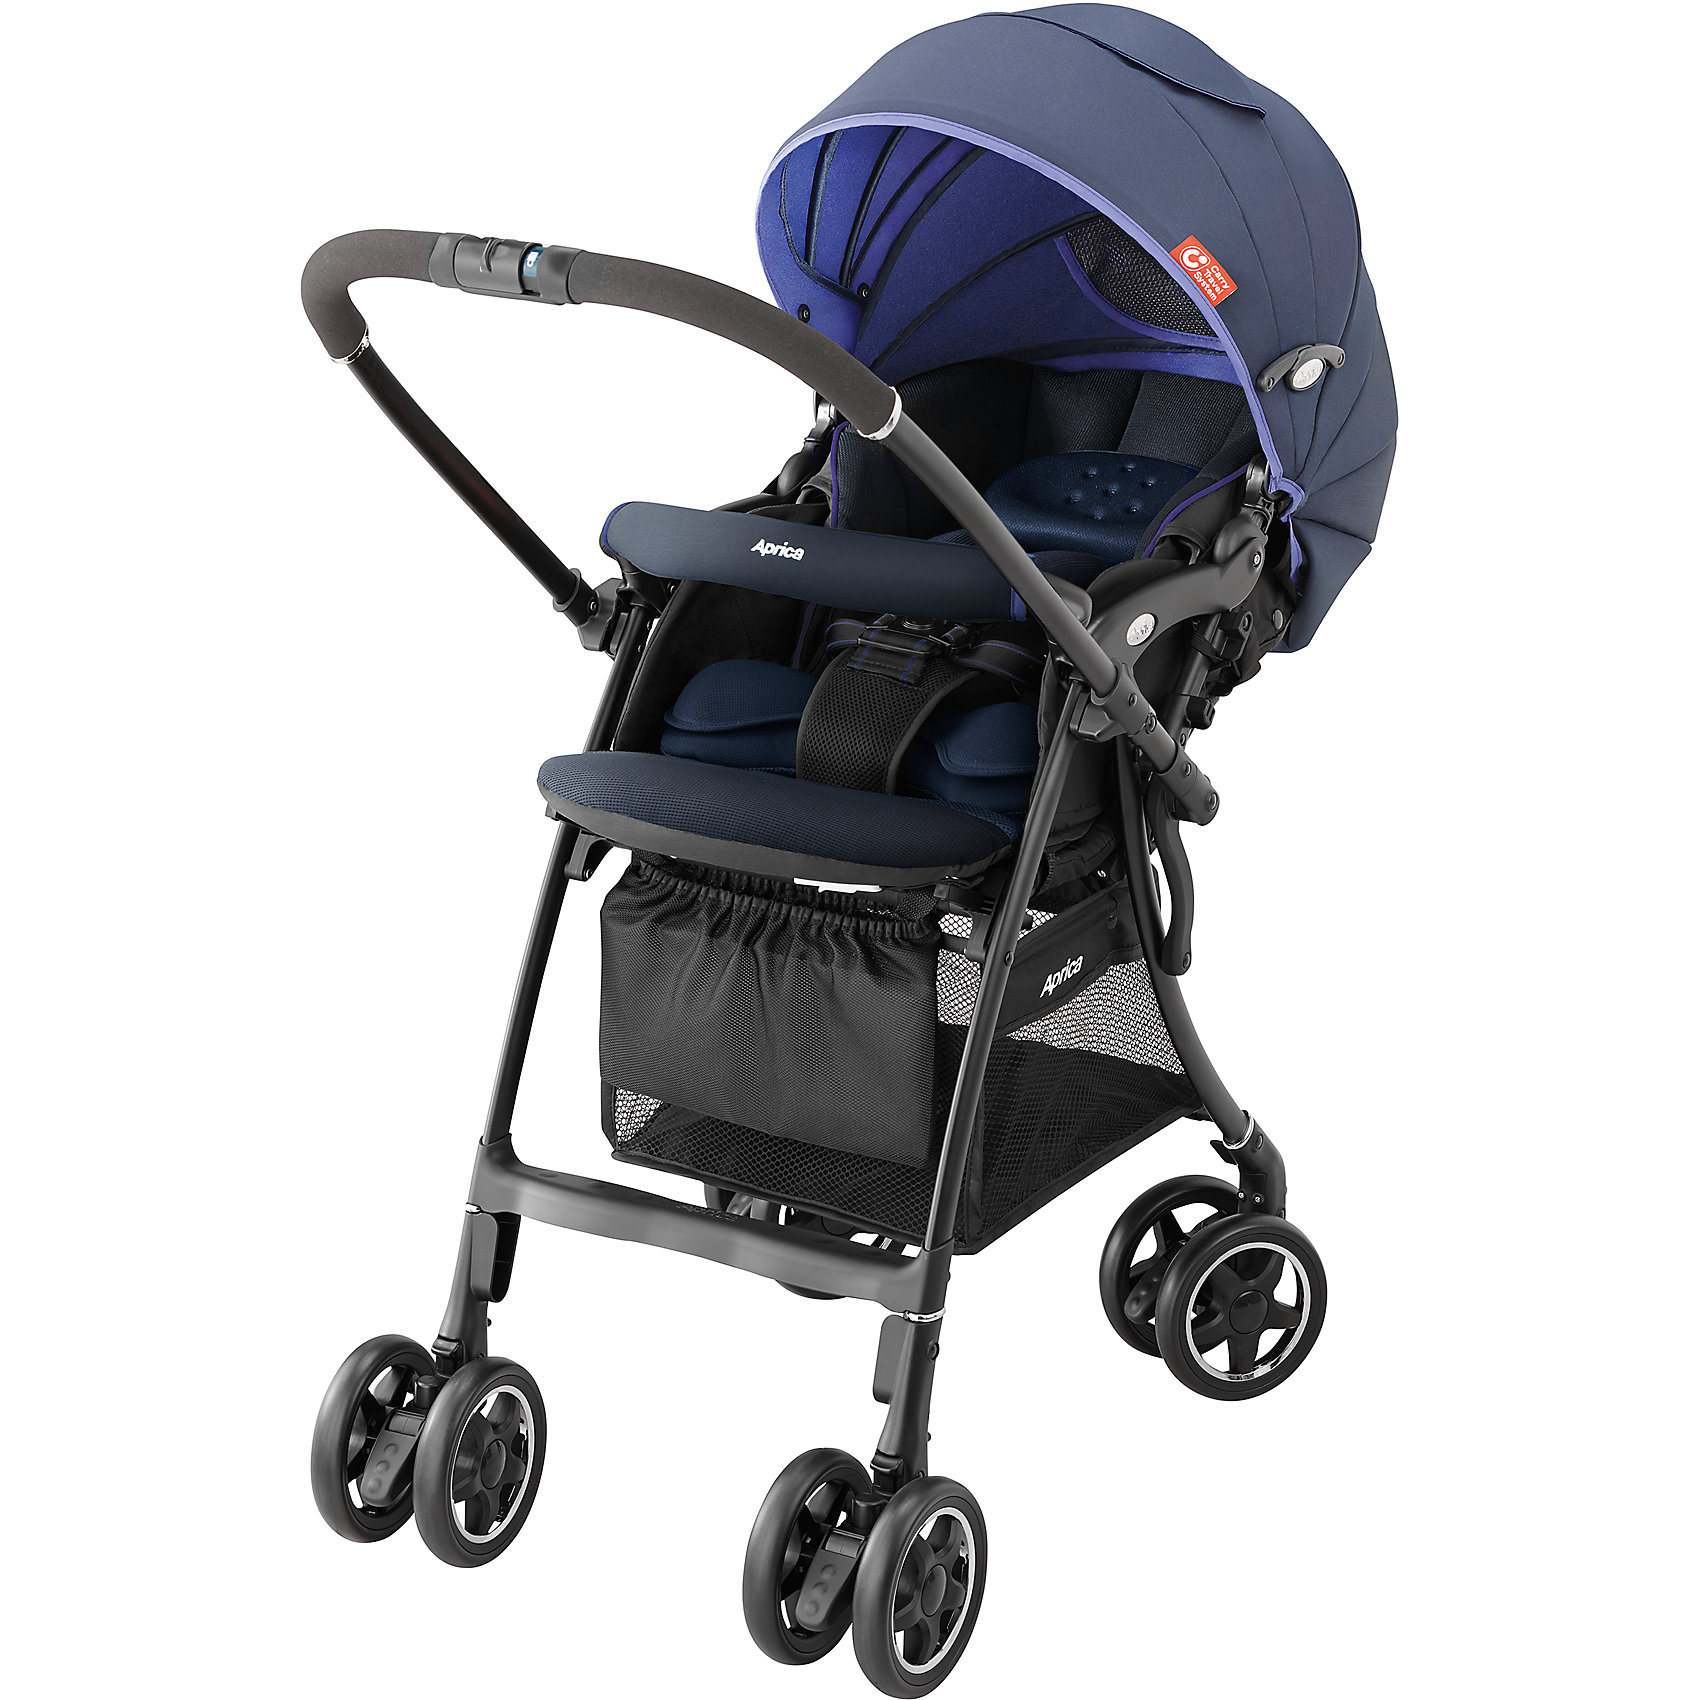 Прогулочная коляска Aprica Luxuna CTS, синий